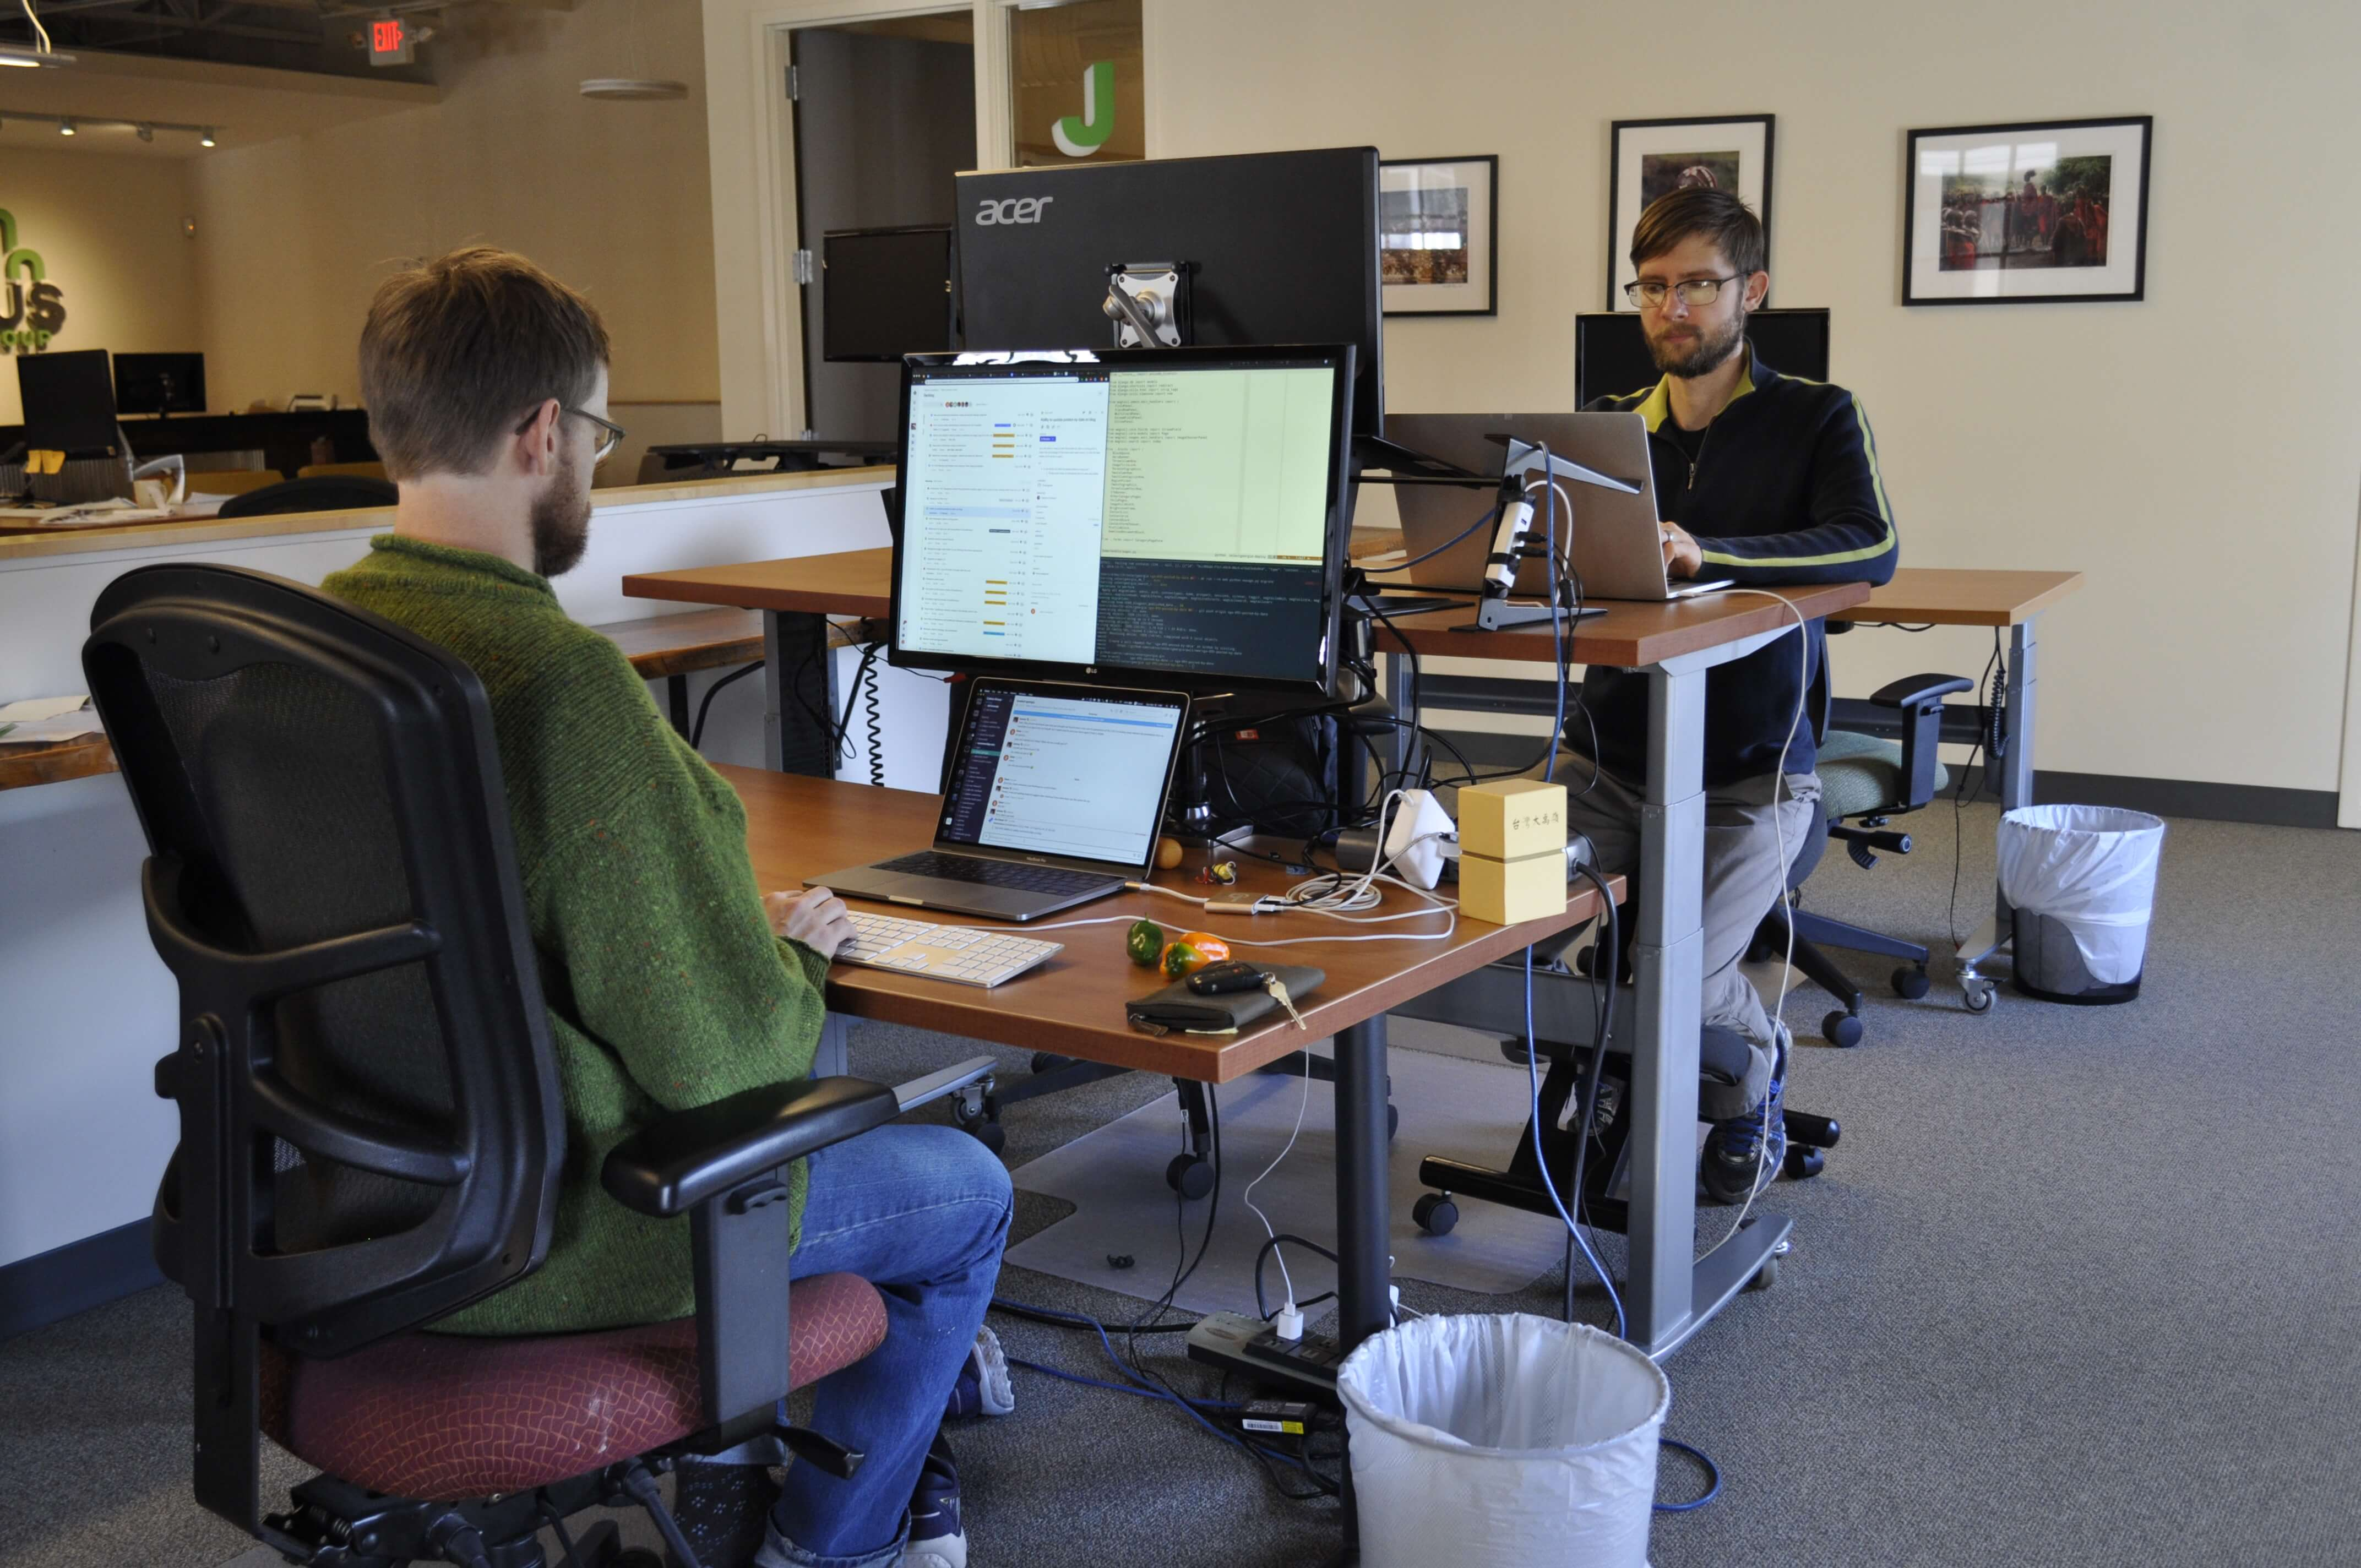 Developers working at their desks